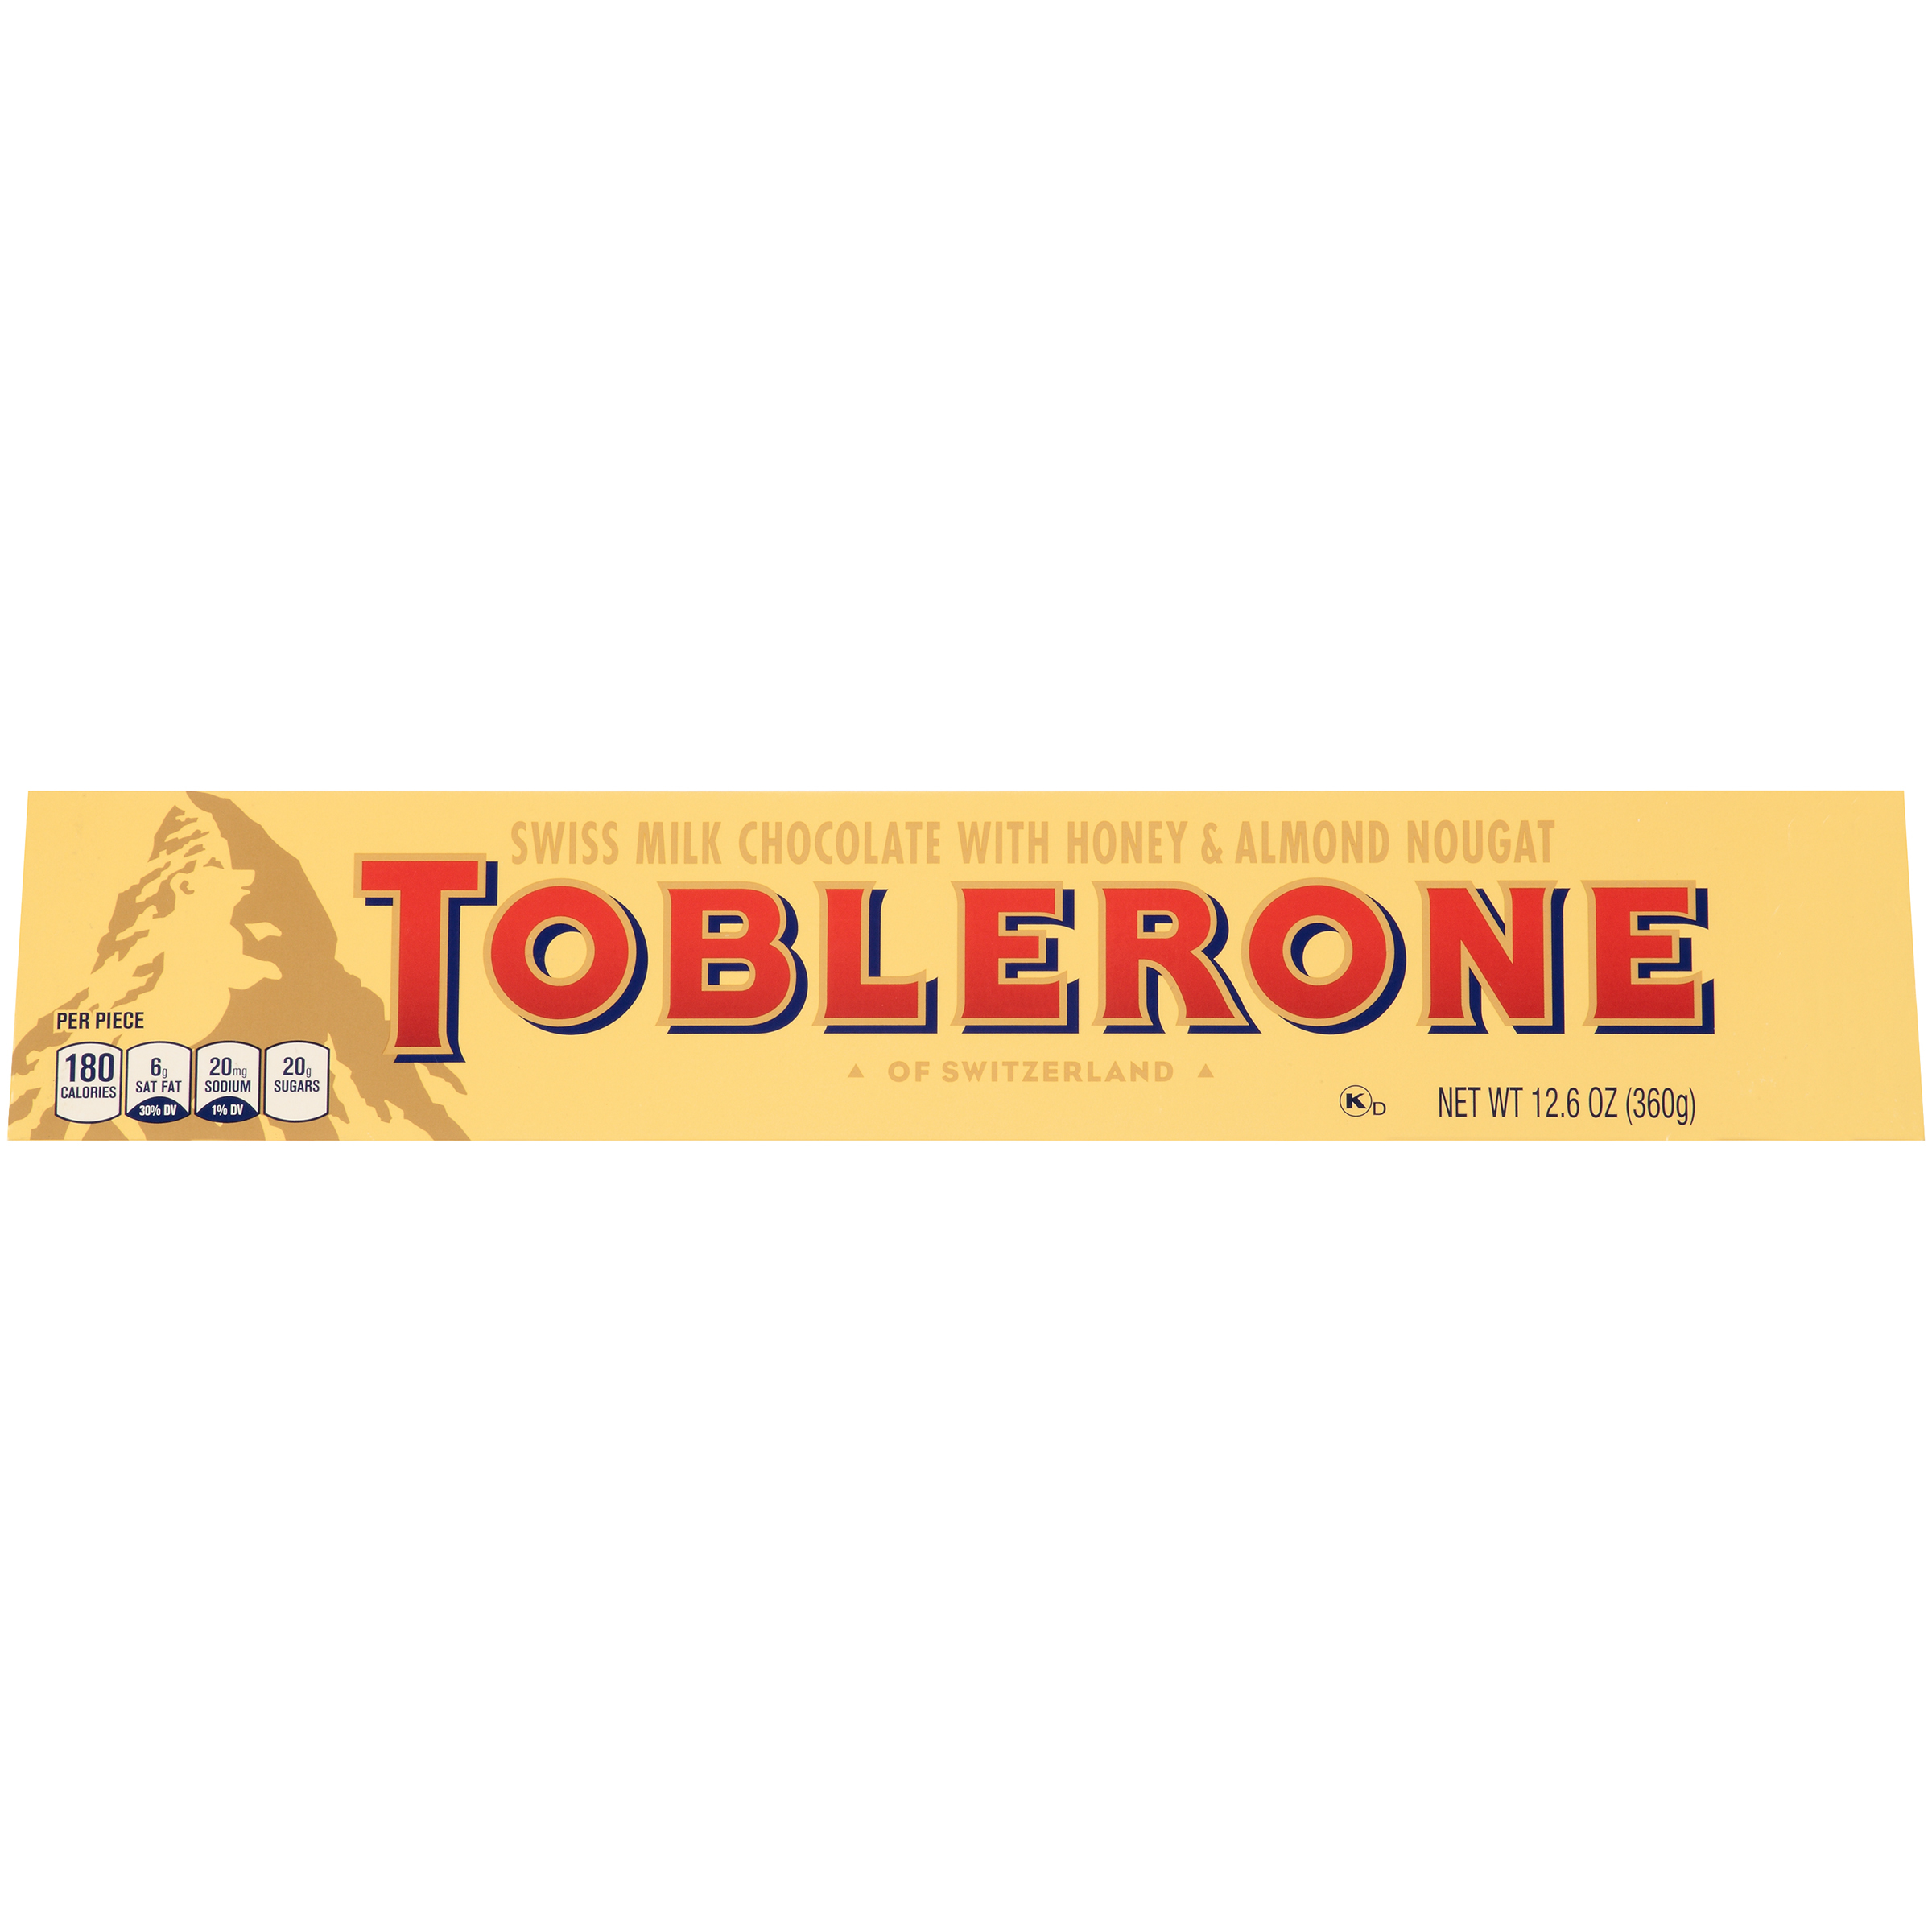 TOBLERONE Milk Chocolate Chocolate Bar 12.6 oz